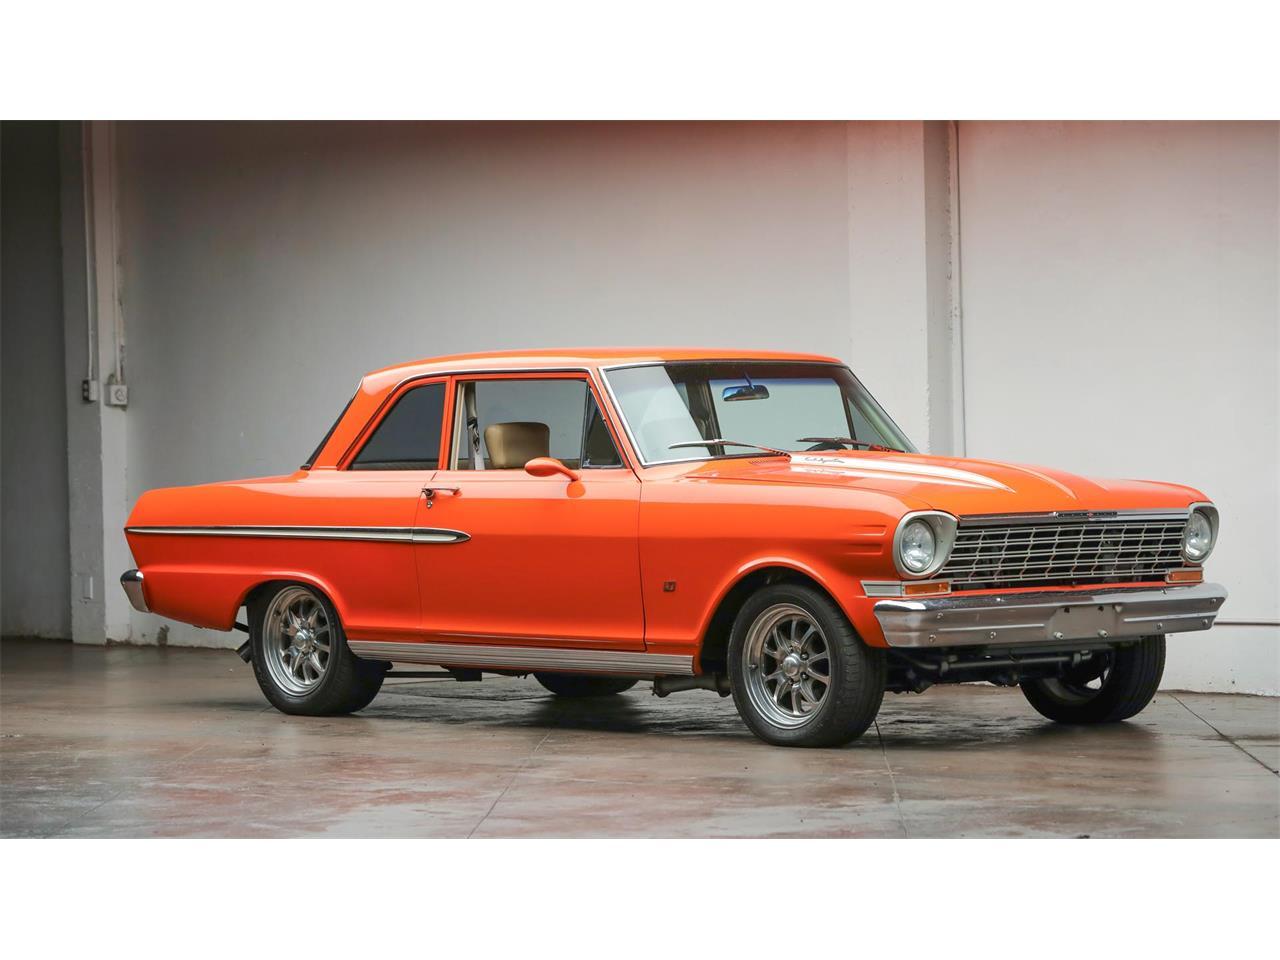 1964 Chevrolet Nova SS (CC-1248397) for sale in Corpus Christi, Texas